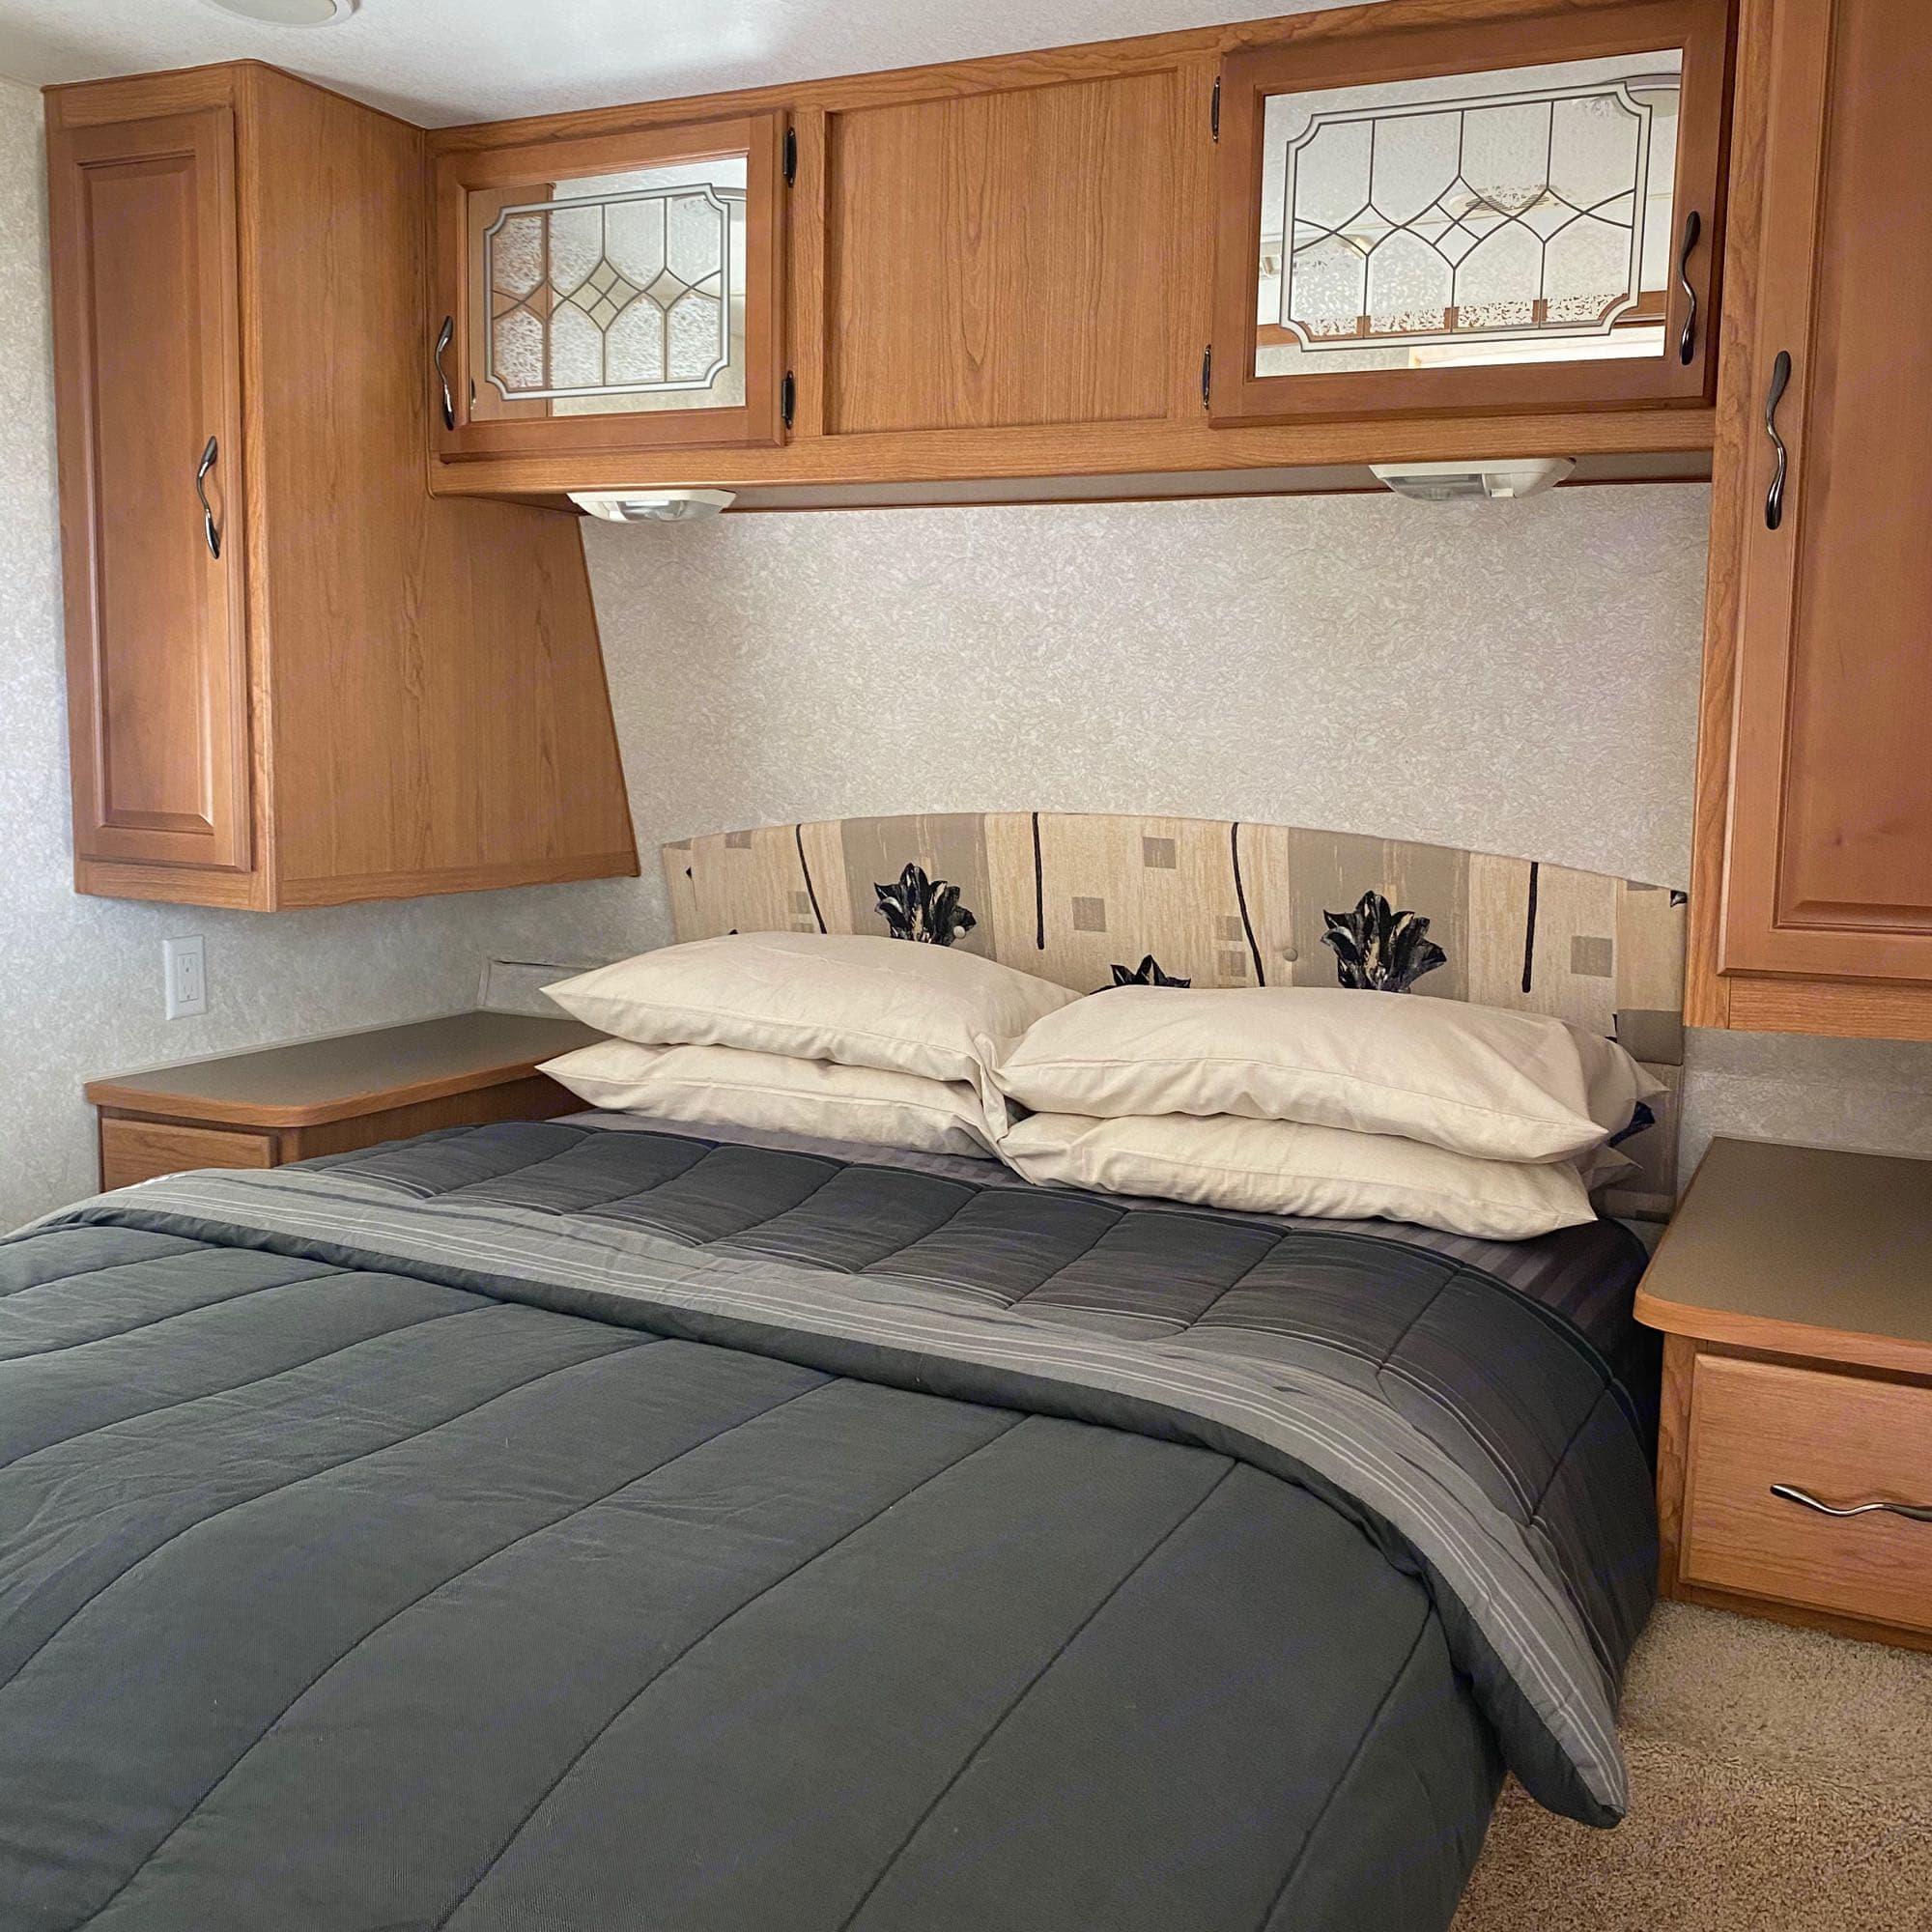 Bed. Fleetwood Terry 2004